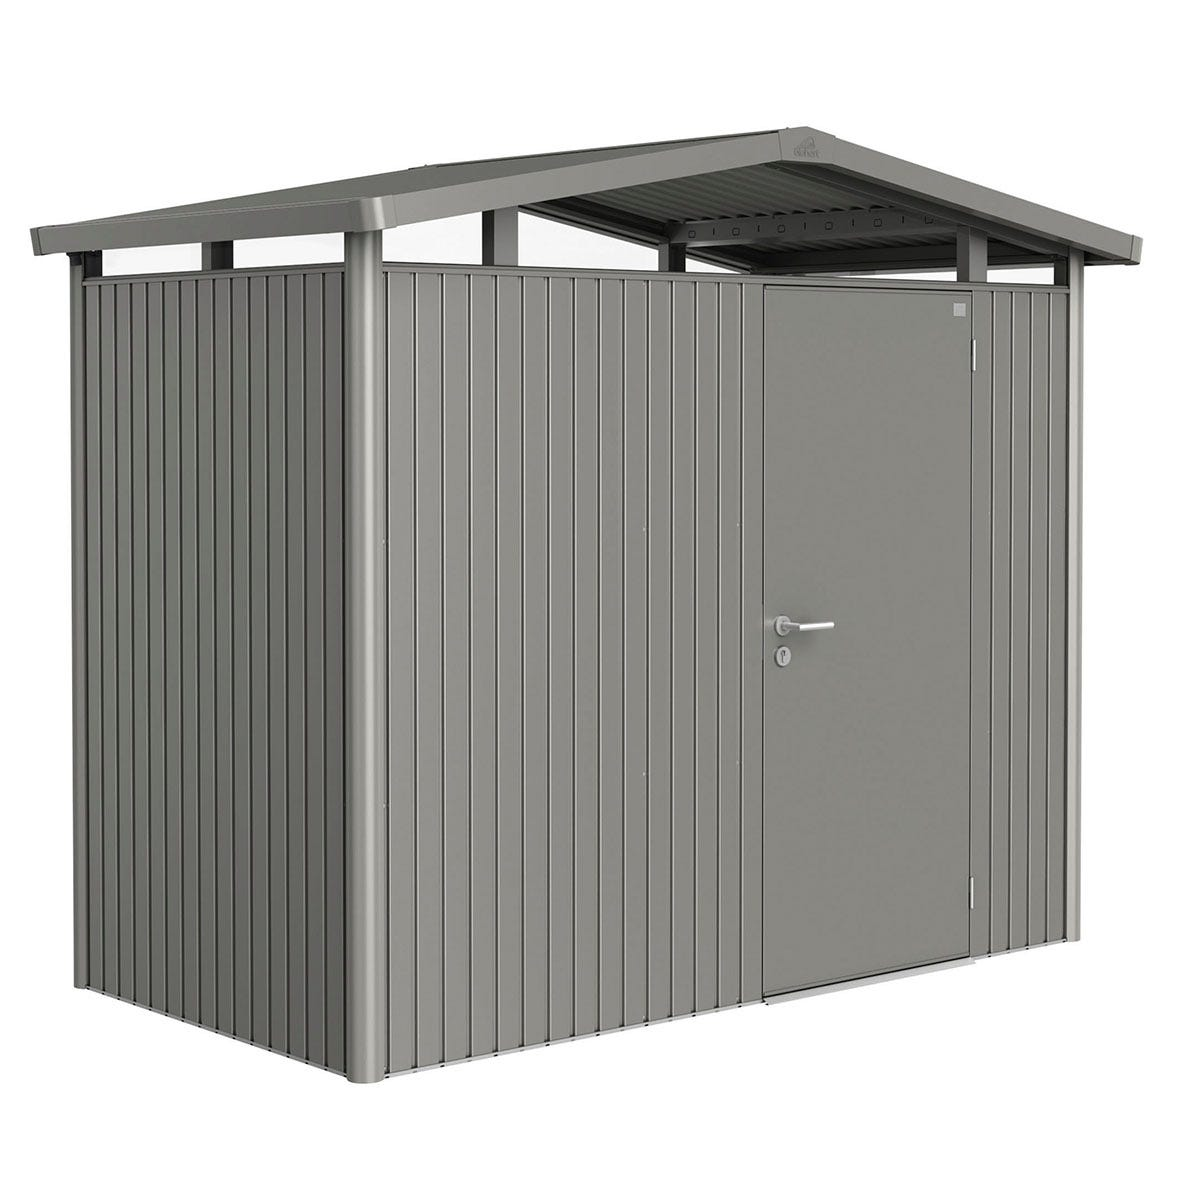 Biohort Panorama Metal Shed P1 Standard door 9' x 5' - Quartz Grey